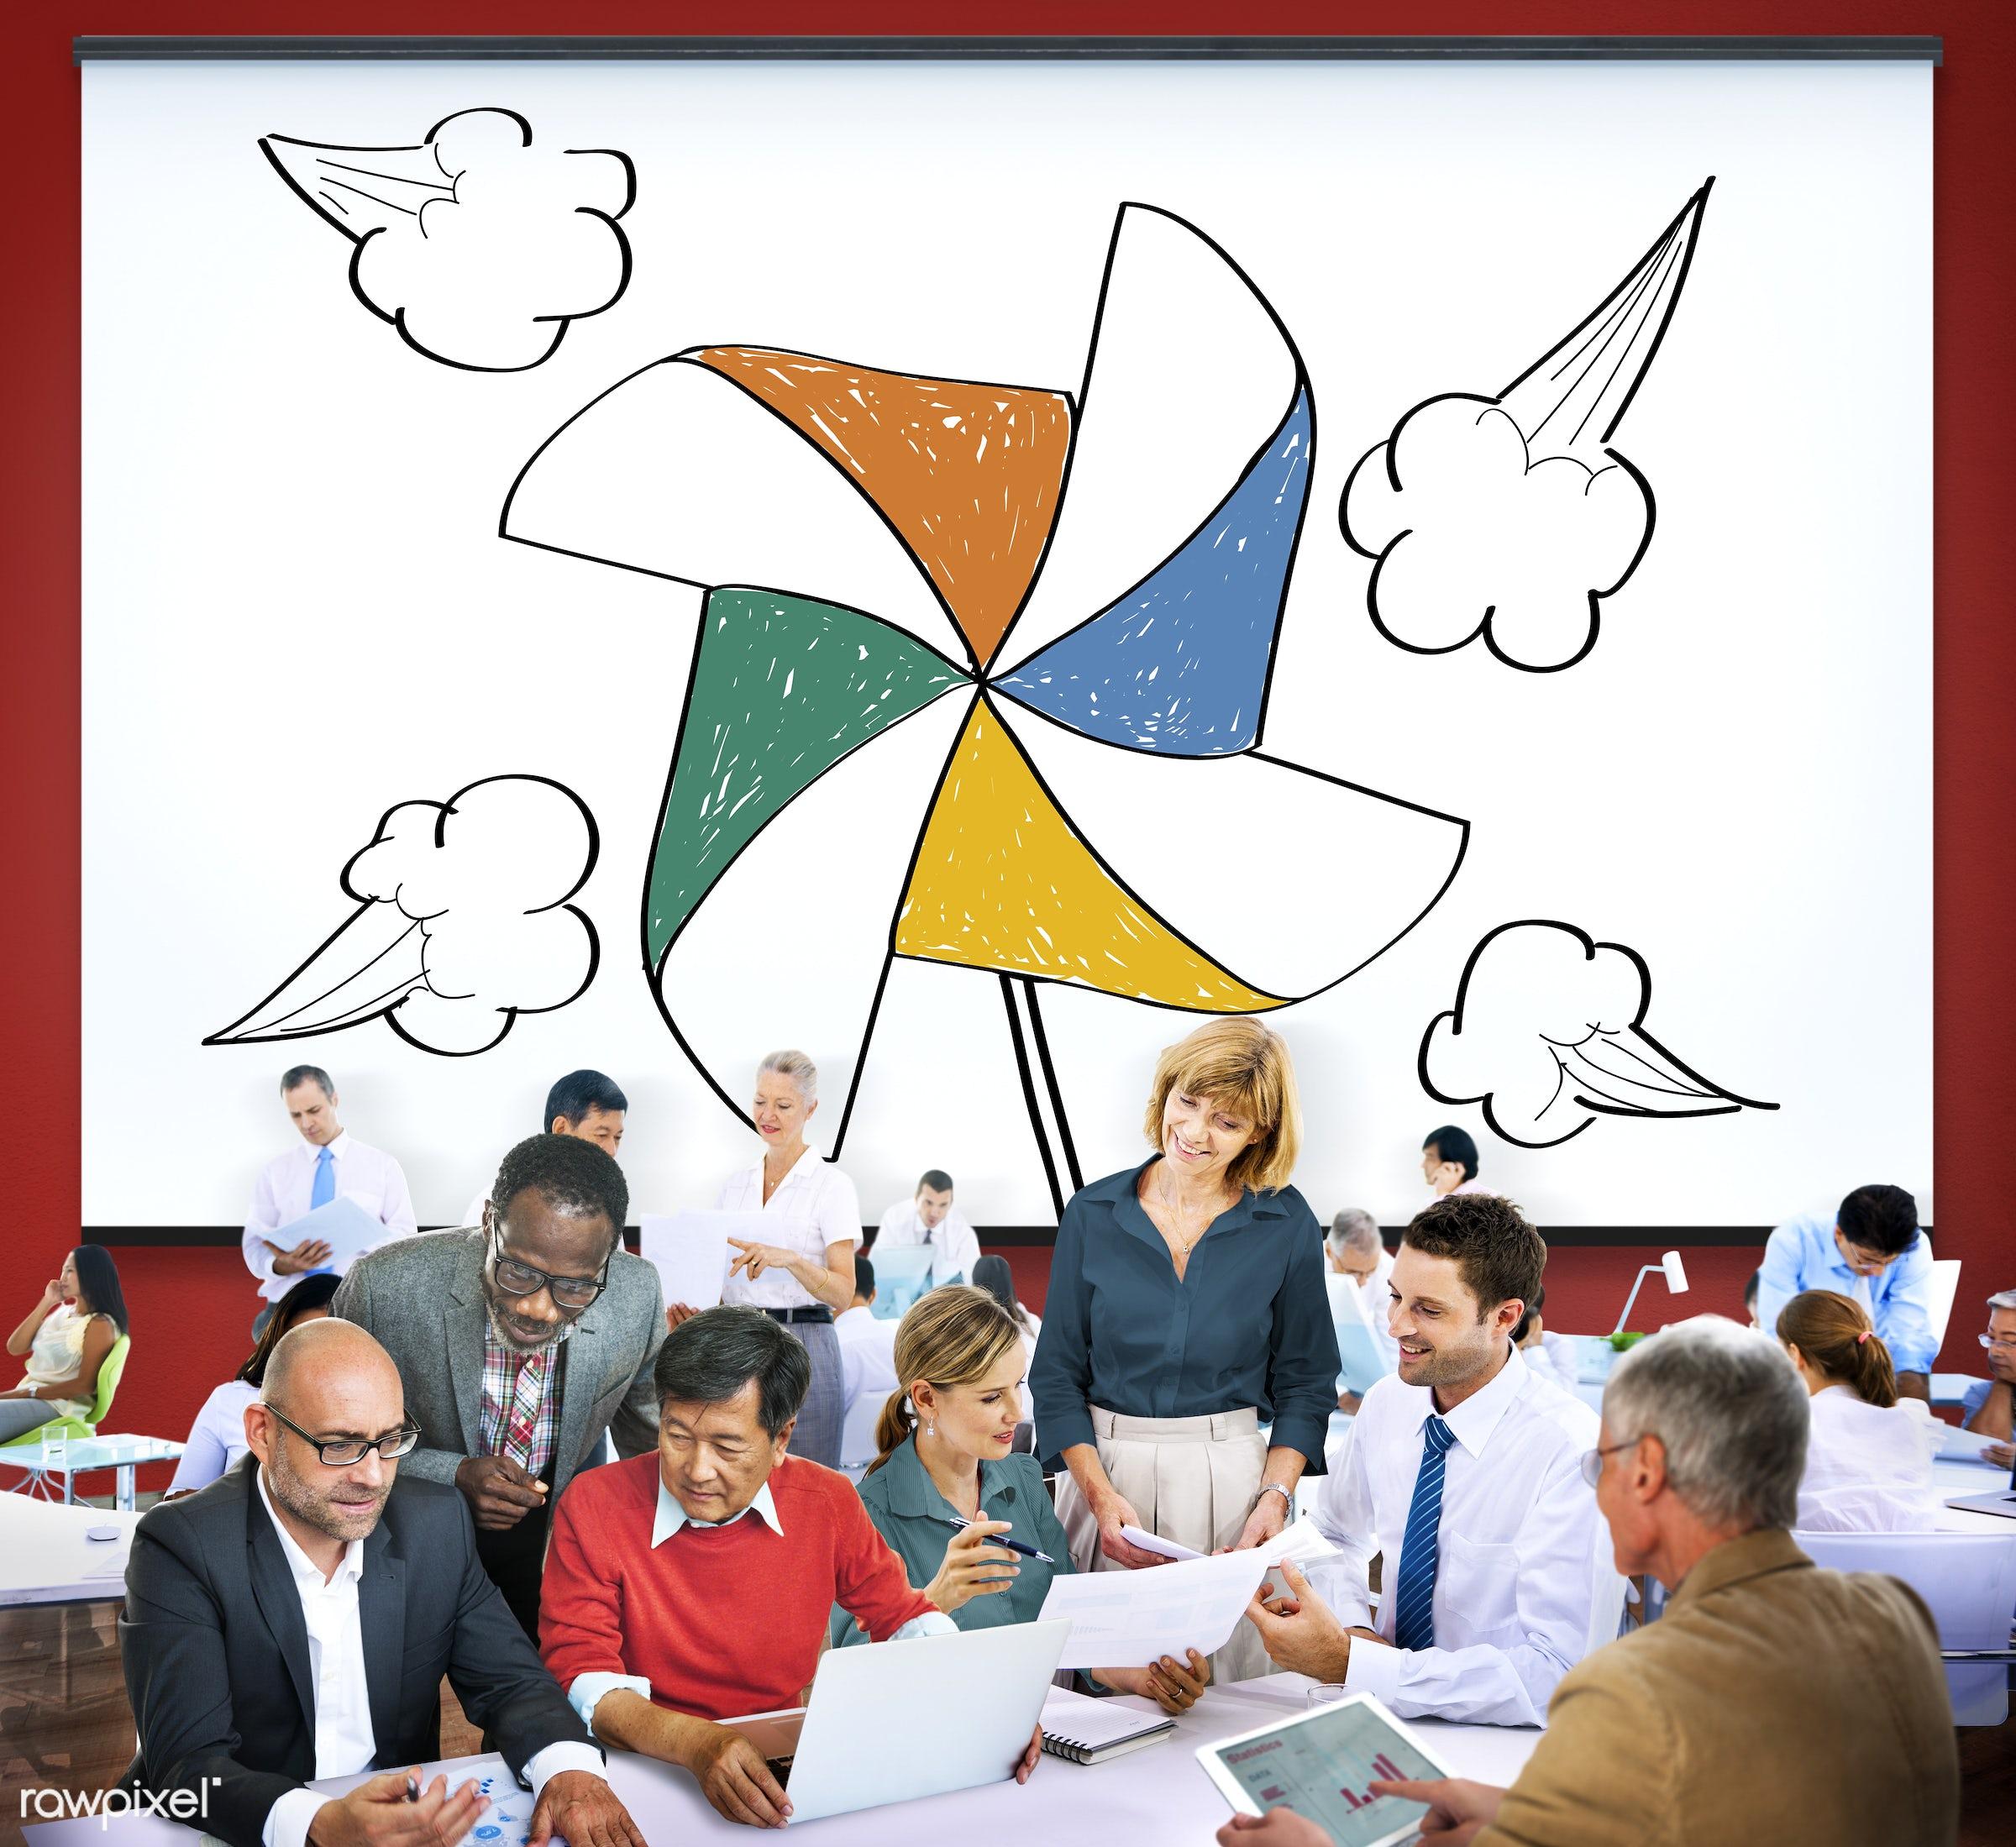 air, analysis, blow, breeze, business, business people, businessmen, businesswomen, busy, communication, conversation,...